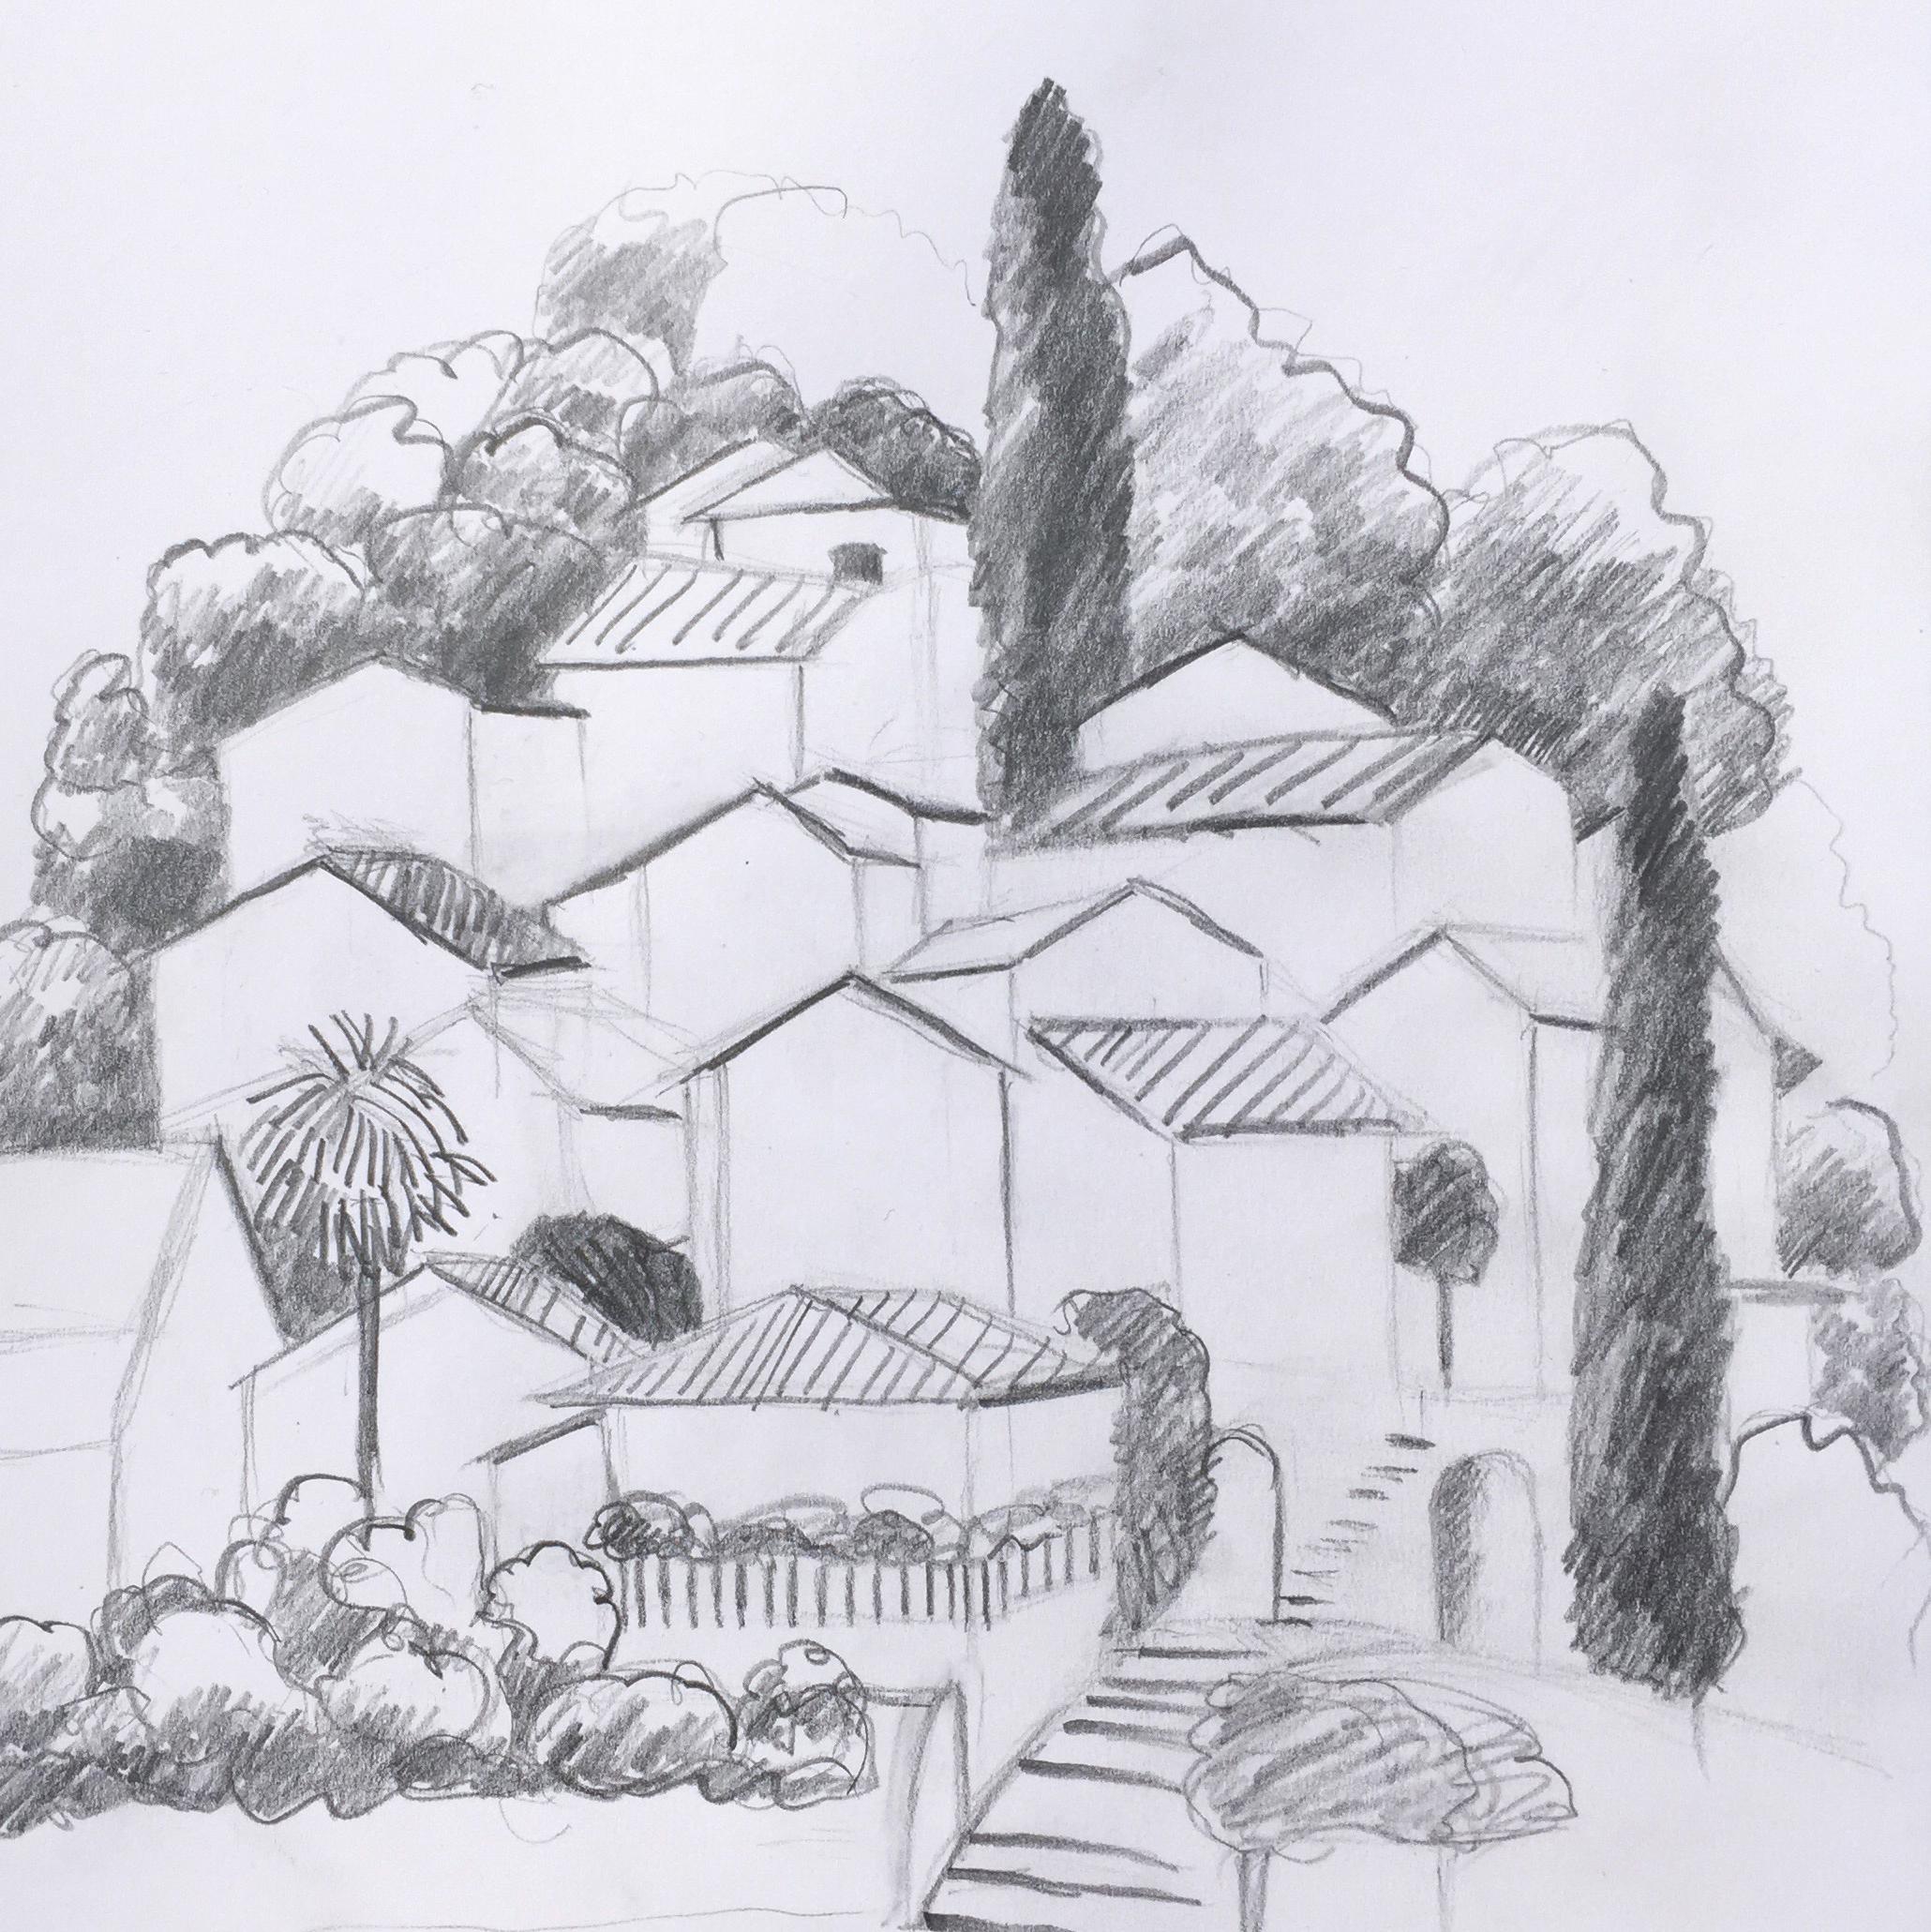 St. Abbondio, Urban Sketching, Workshopwoch,Astrid Amadeo